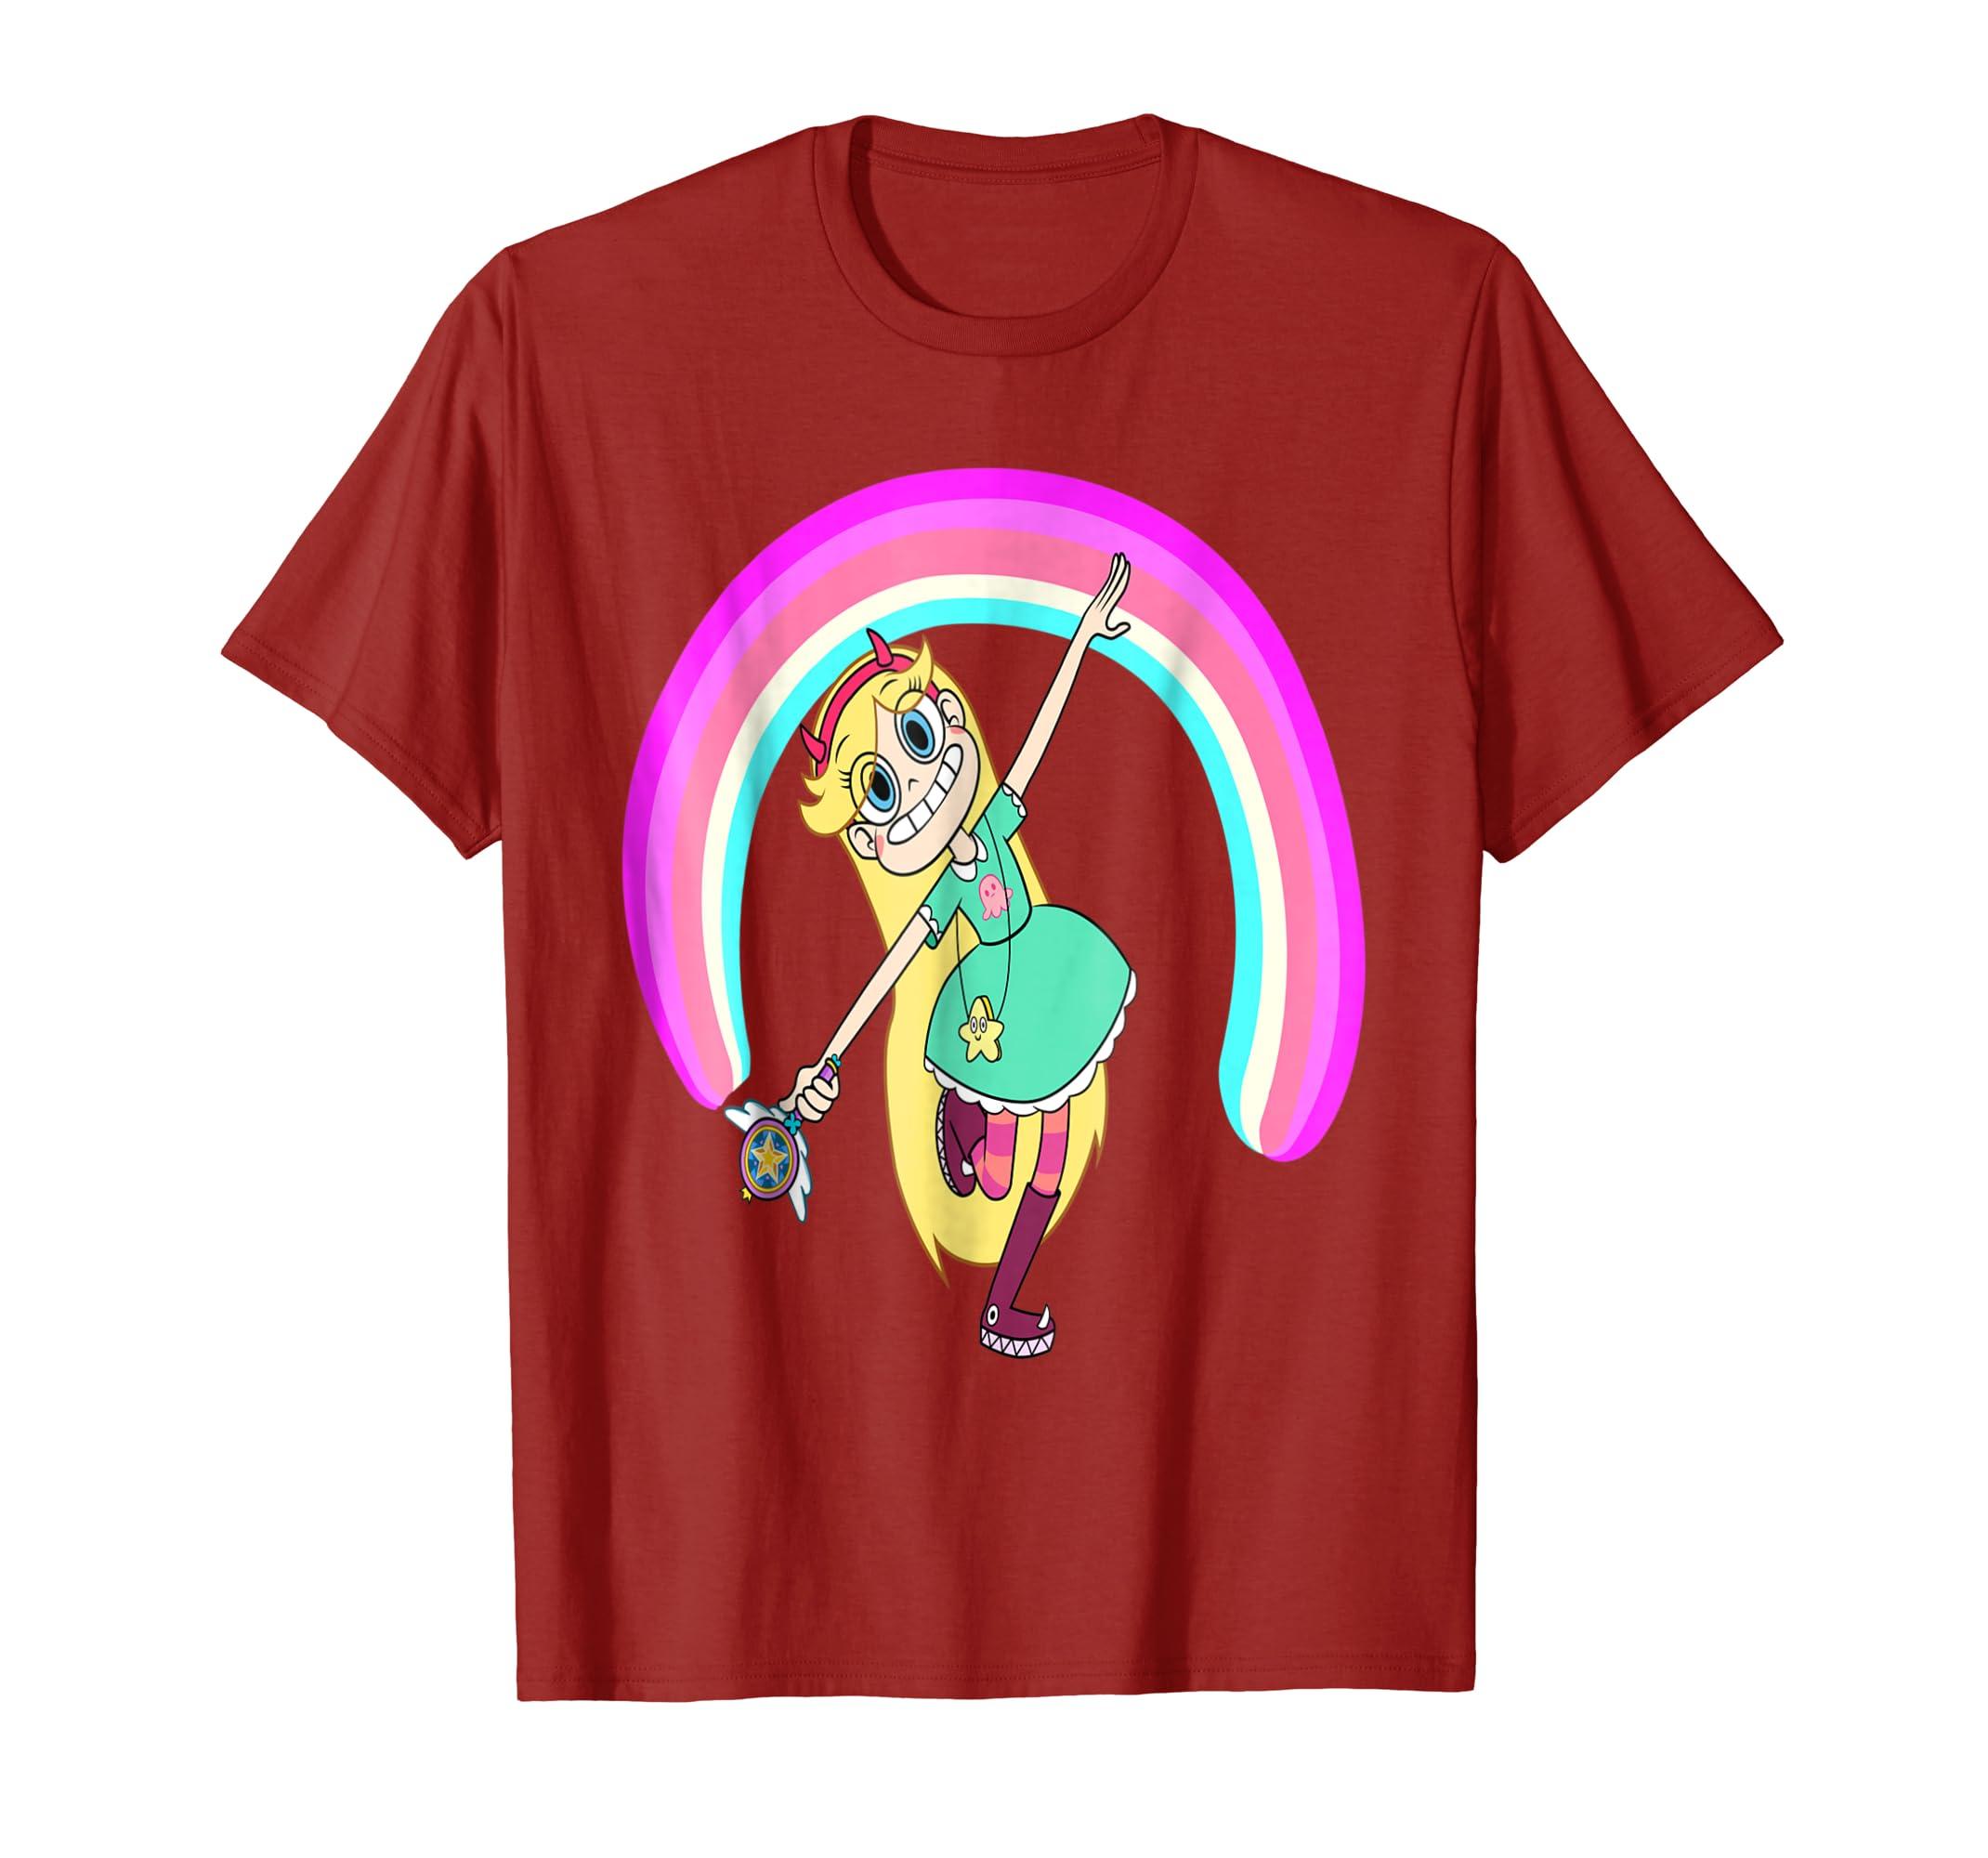 Tshirts-Awarplus